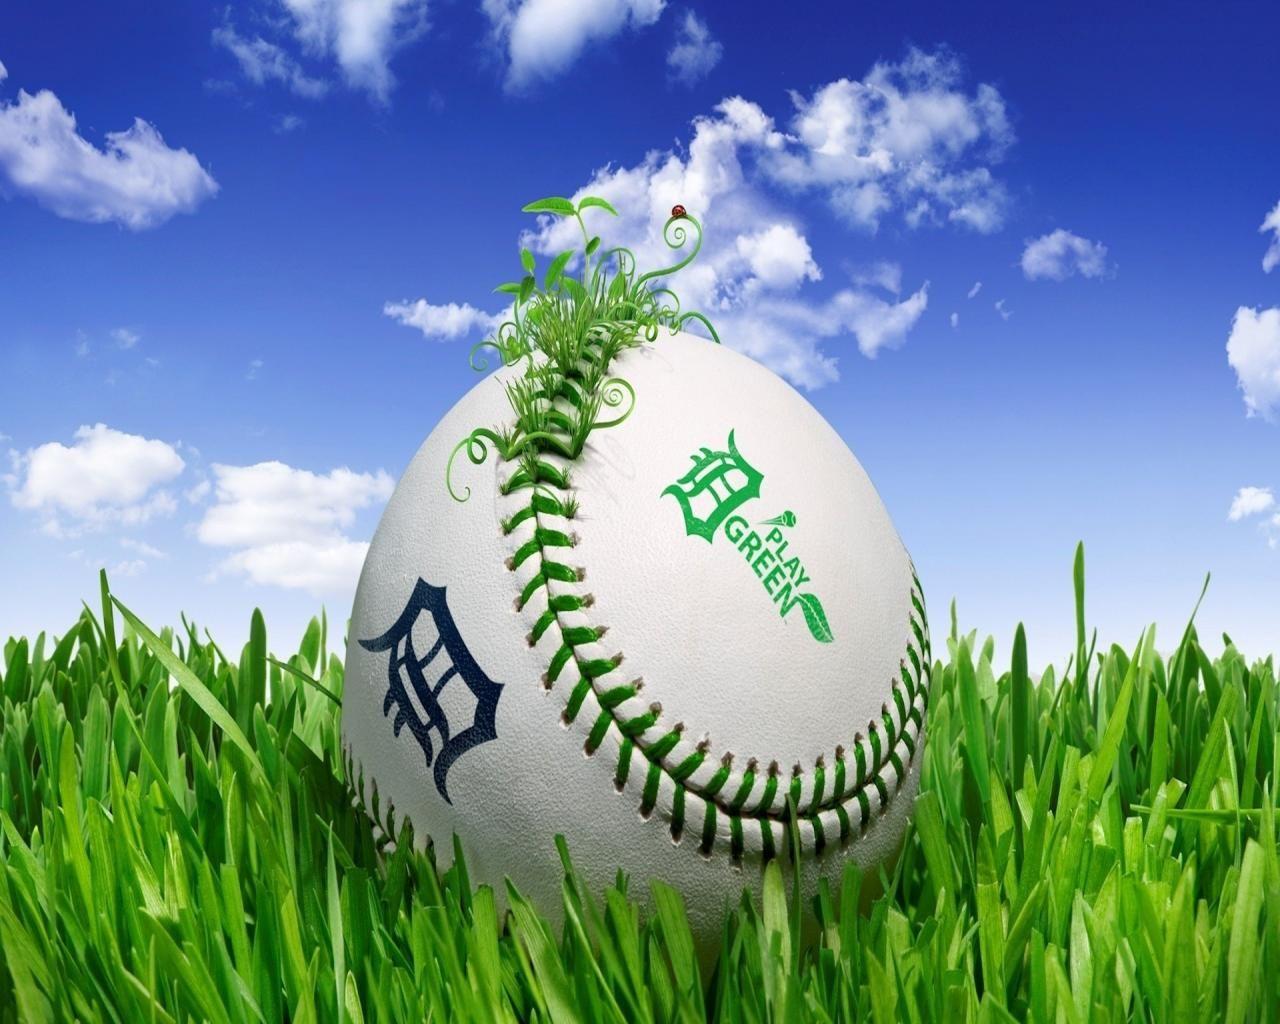 BaseballGreen3DCreativefreehdwallpapersfordesktop